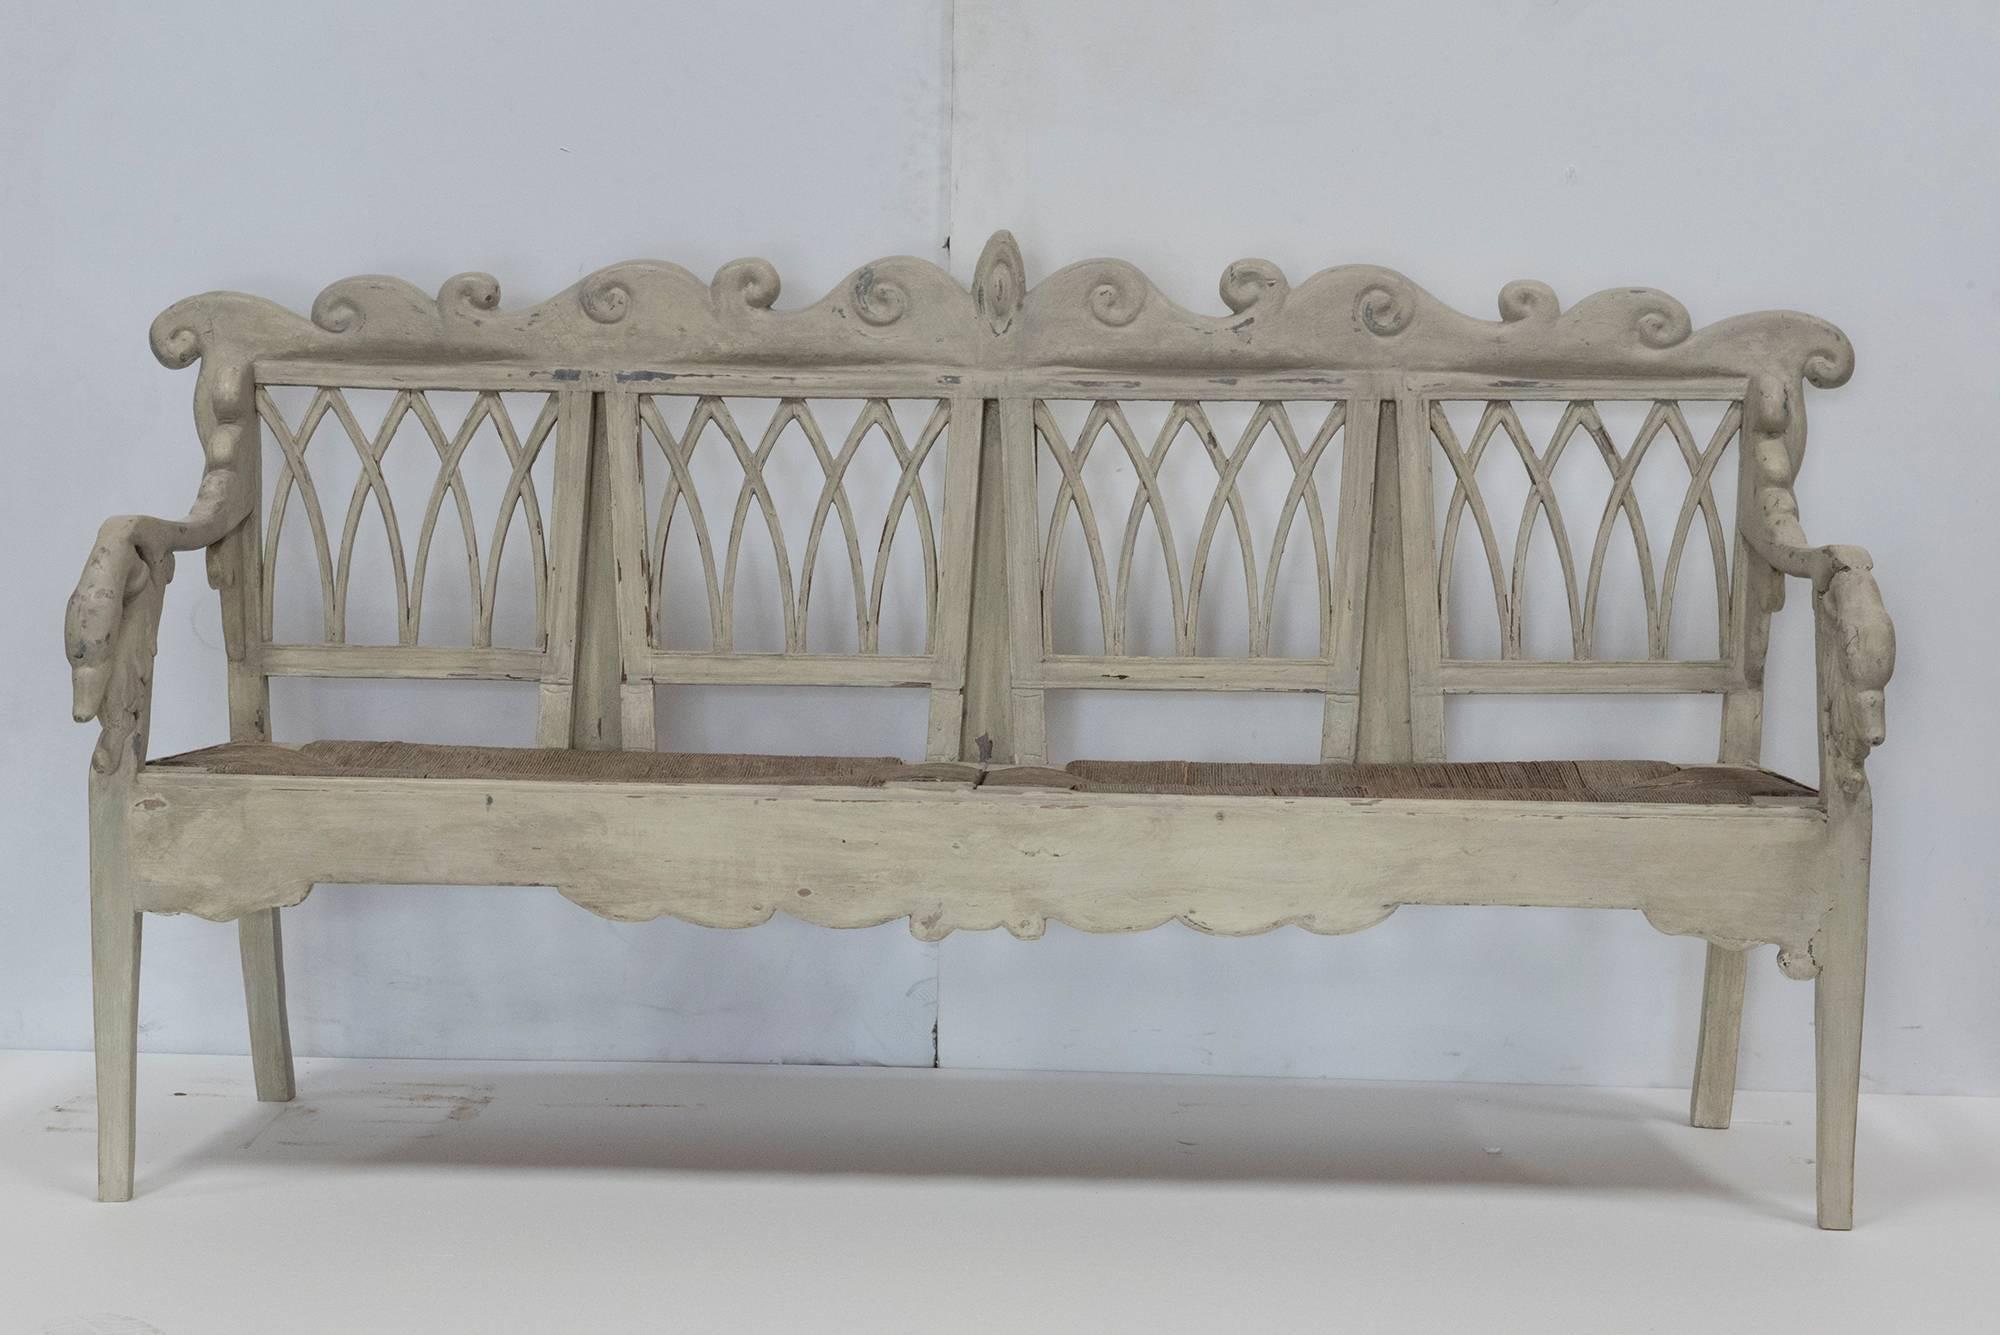 Sensational Gustavian Carved Swan Bench For Sale At 1Stdibs Creativecarmelina Interior Chair Design Creativecarmelinacom